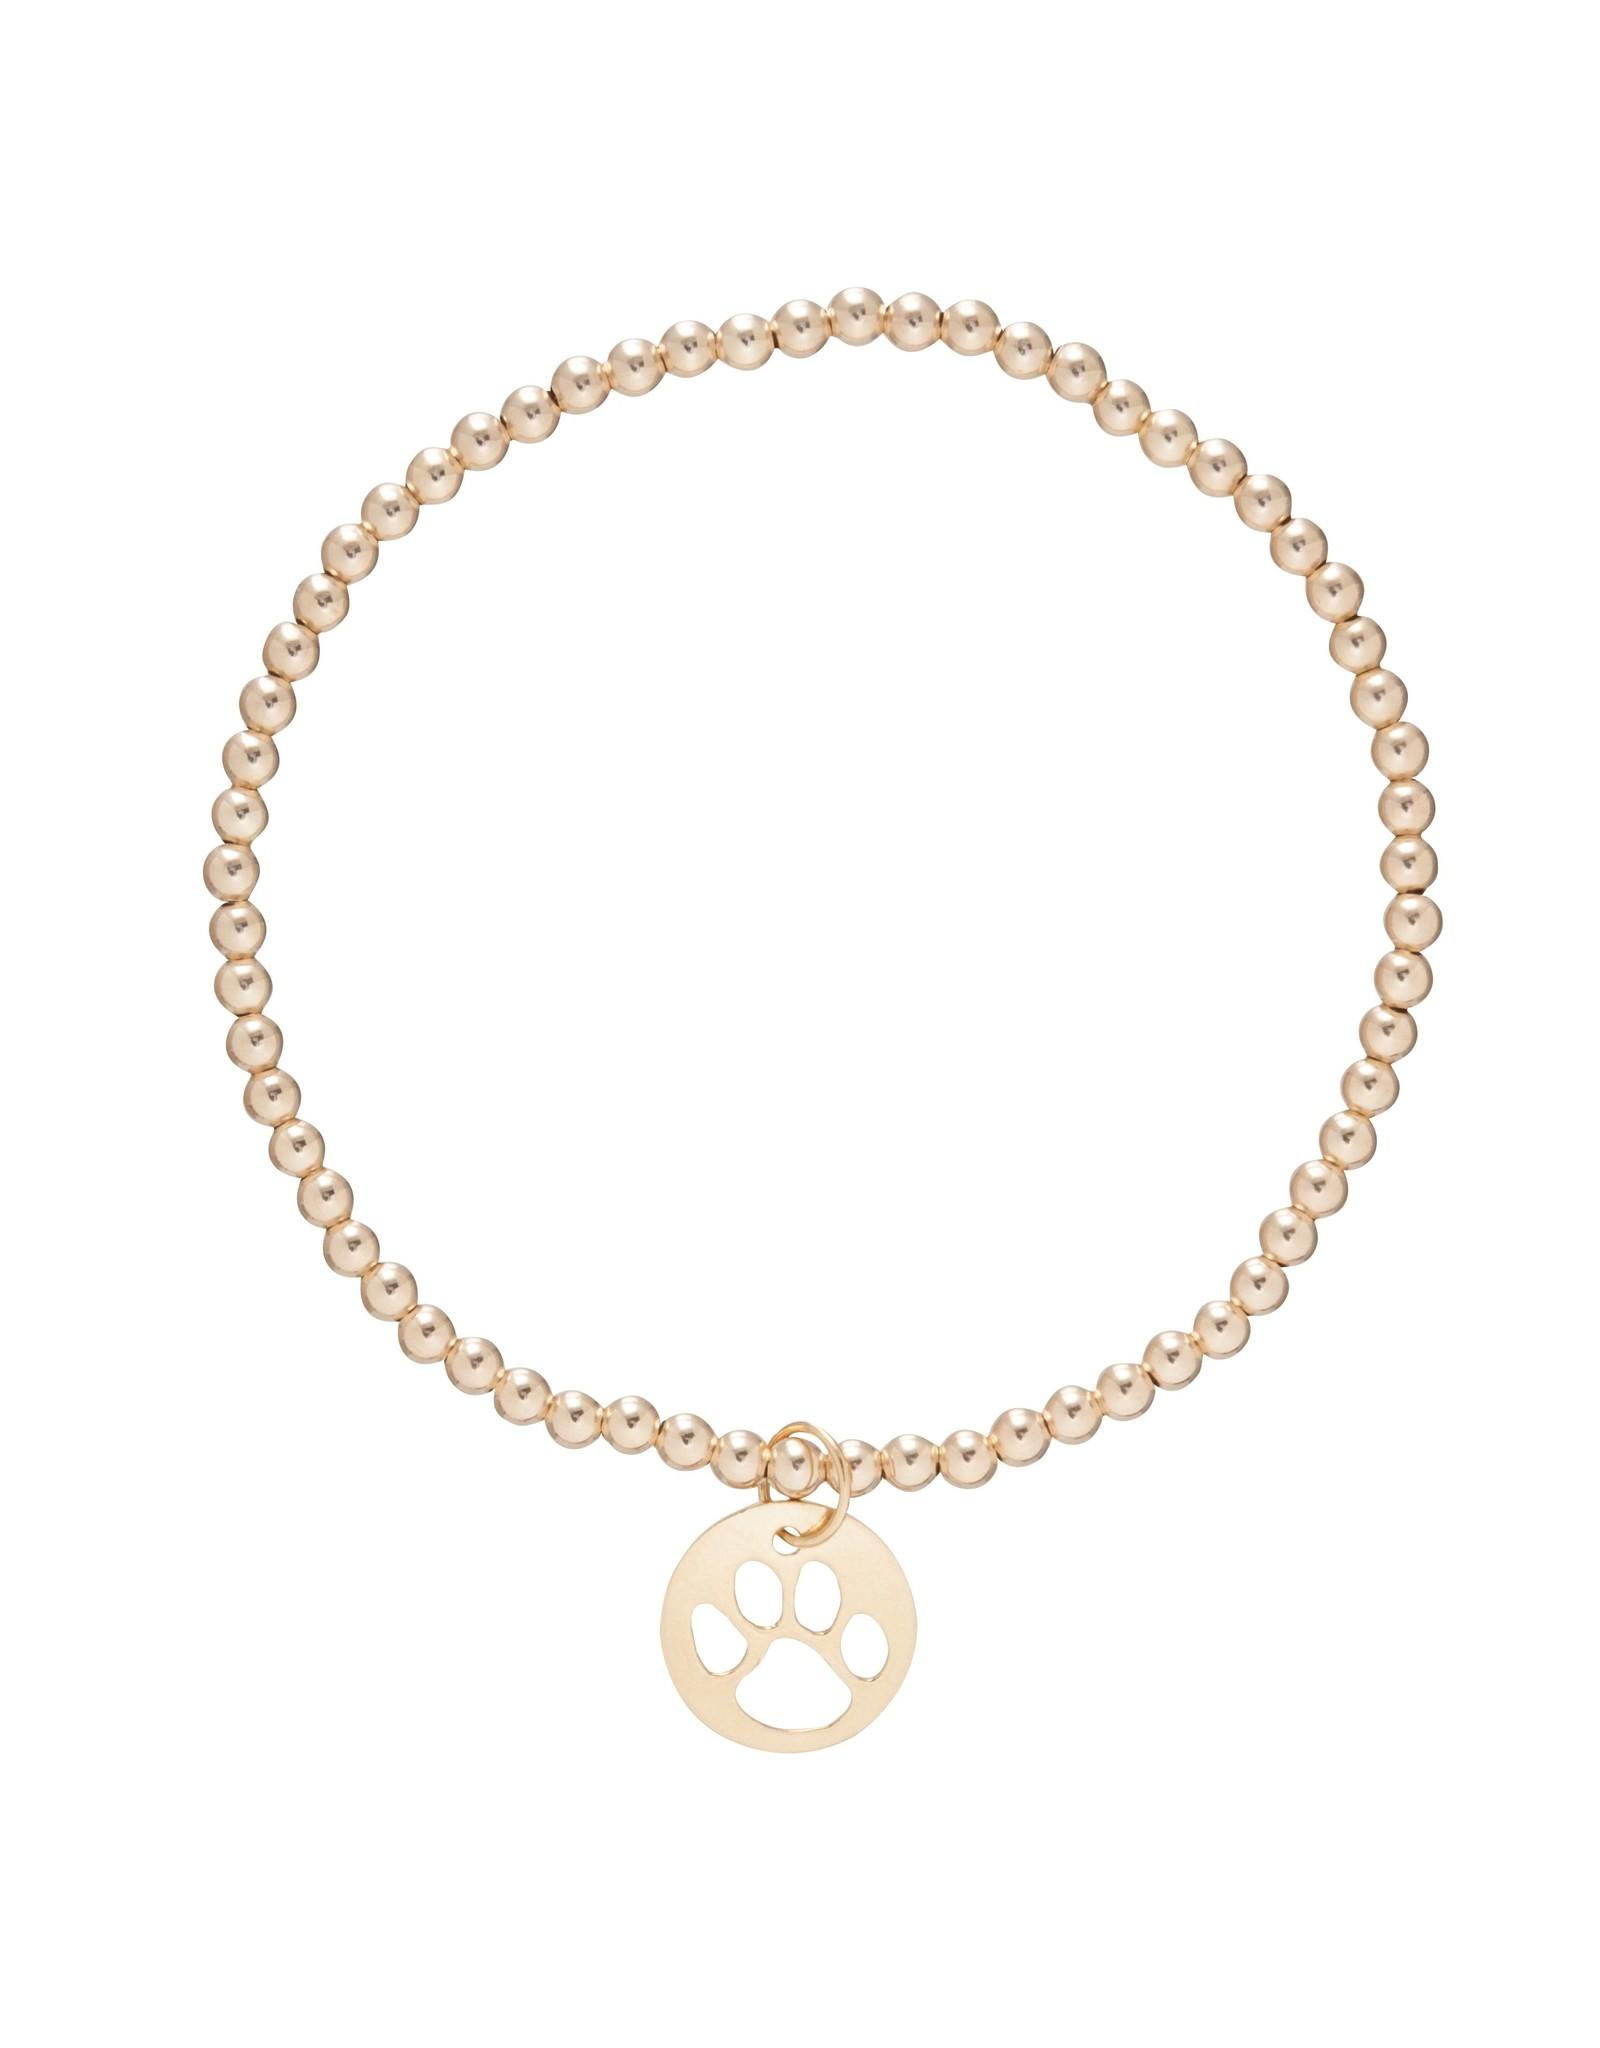 ENewton Classic Gold Paw Print Beaded Bracelet 3MM